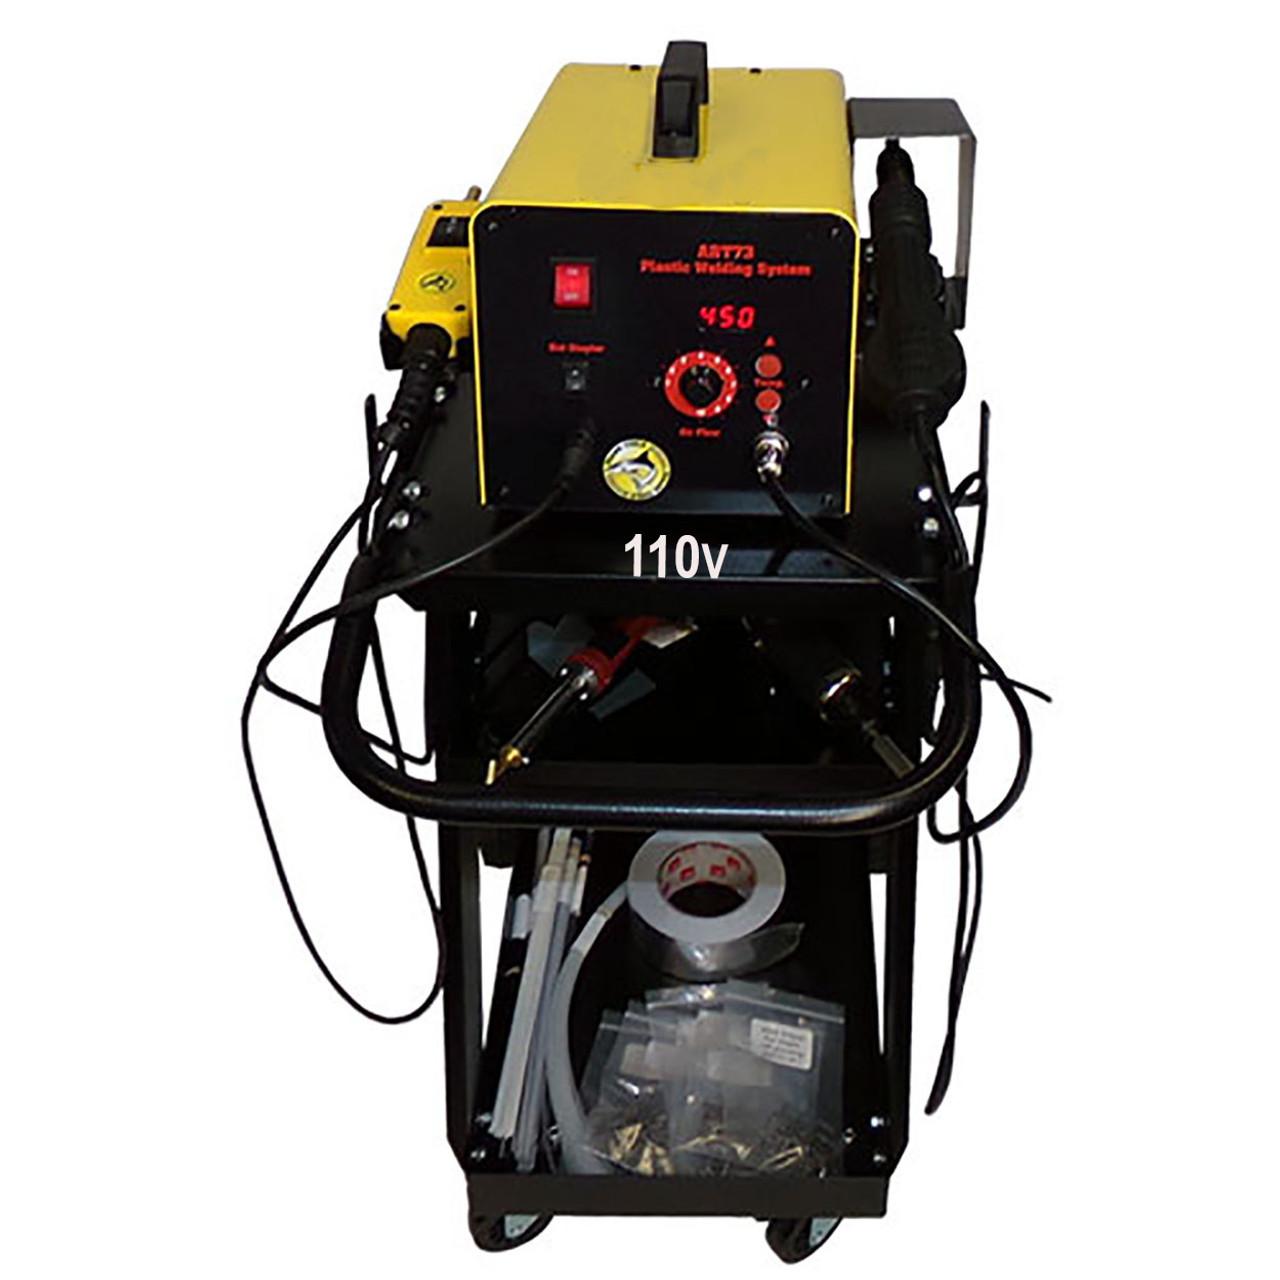 Killer Tools ART73 Plastic Repair  and welding System 110v